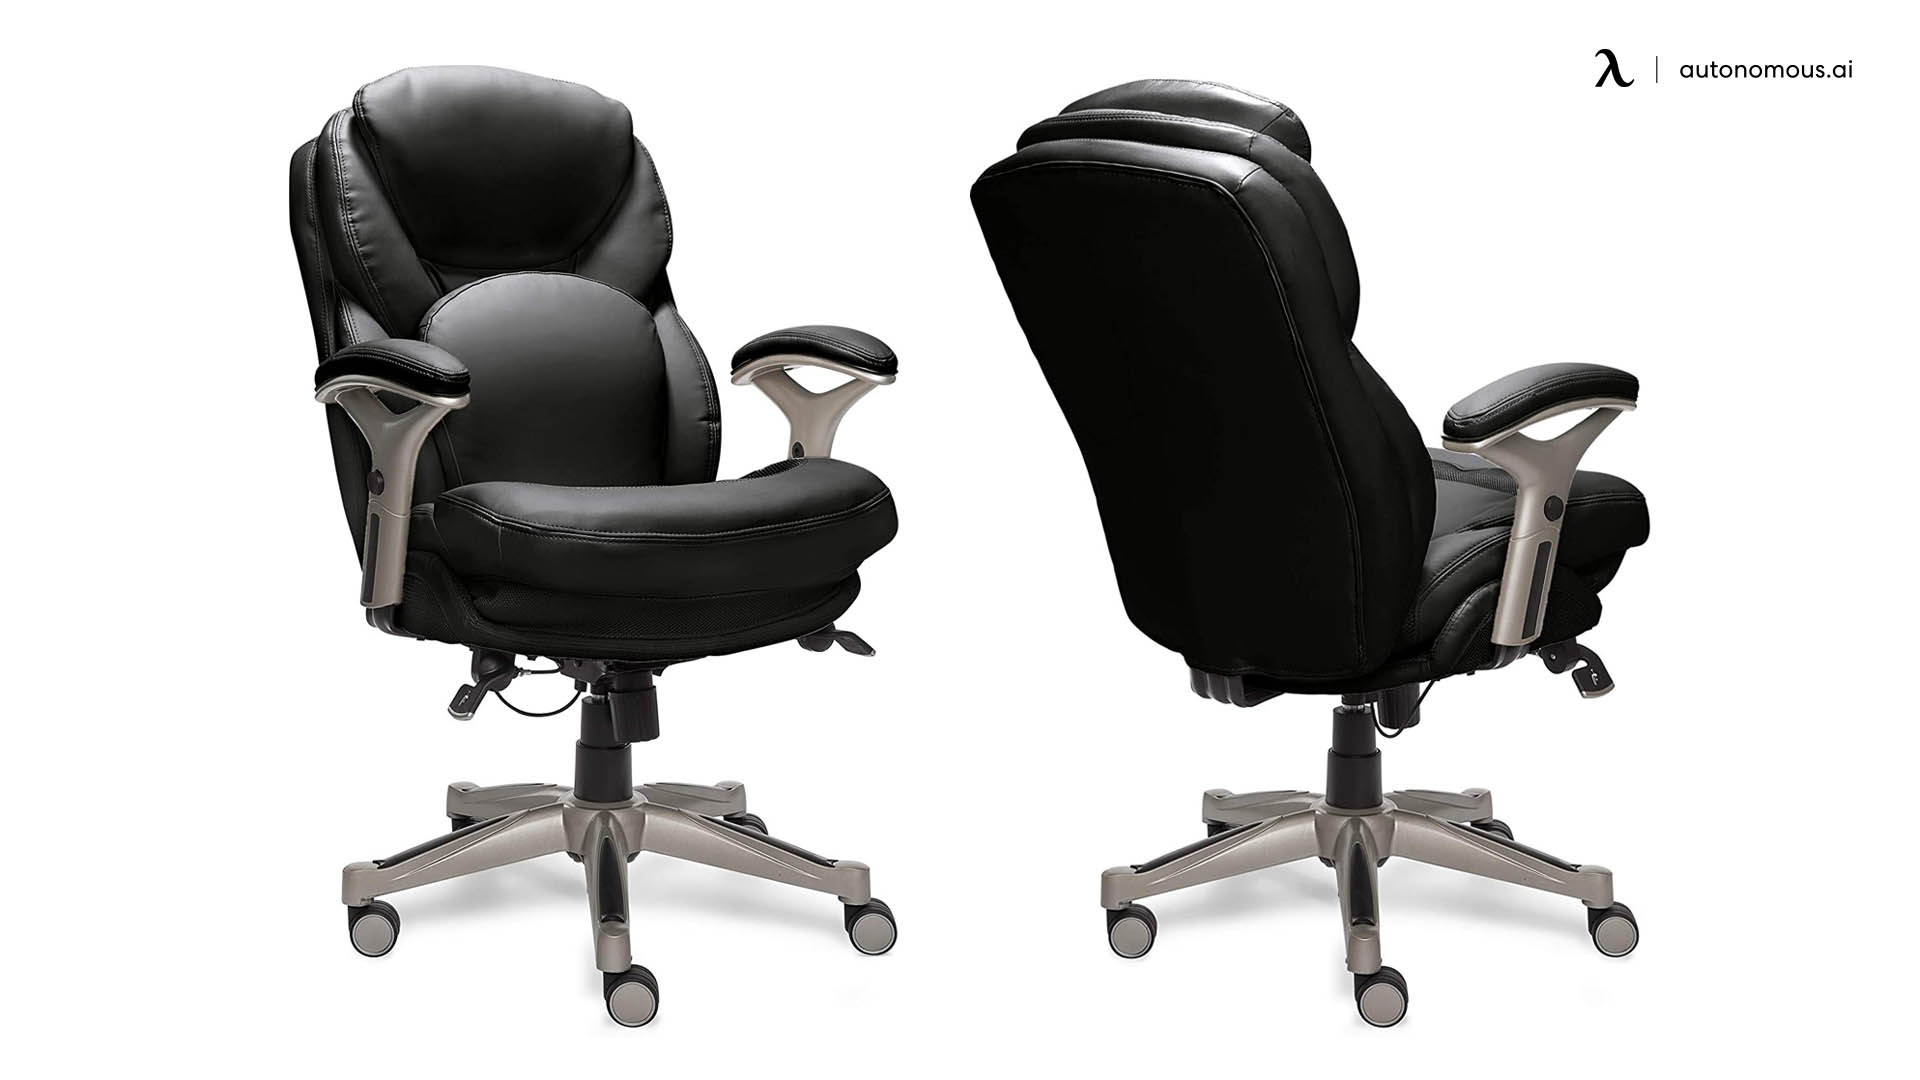 Serta Big & Tall Executive Chair